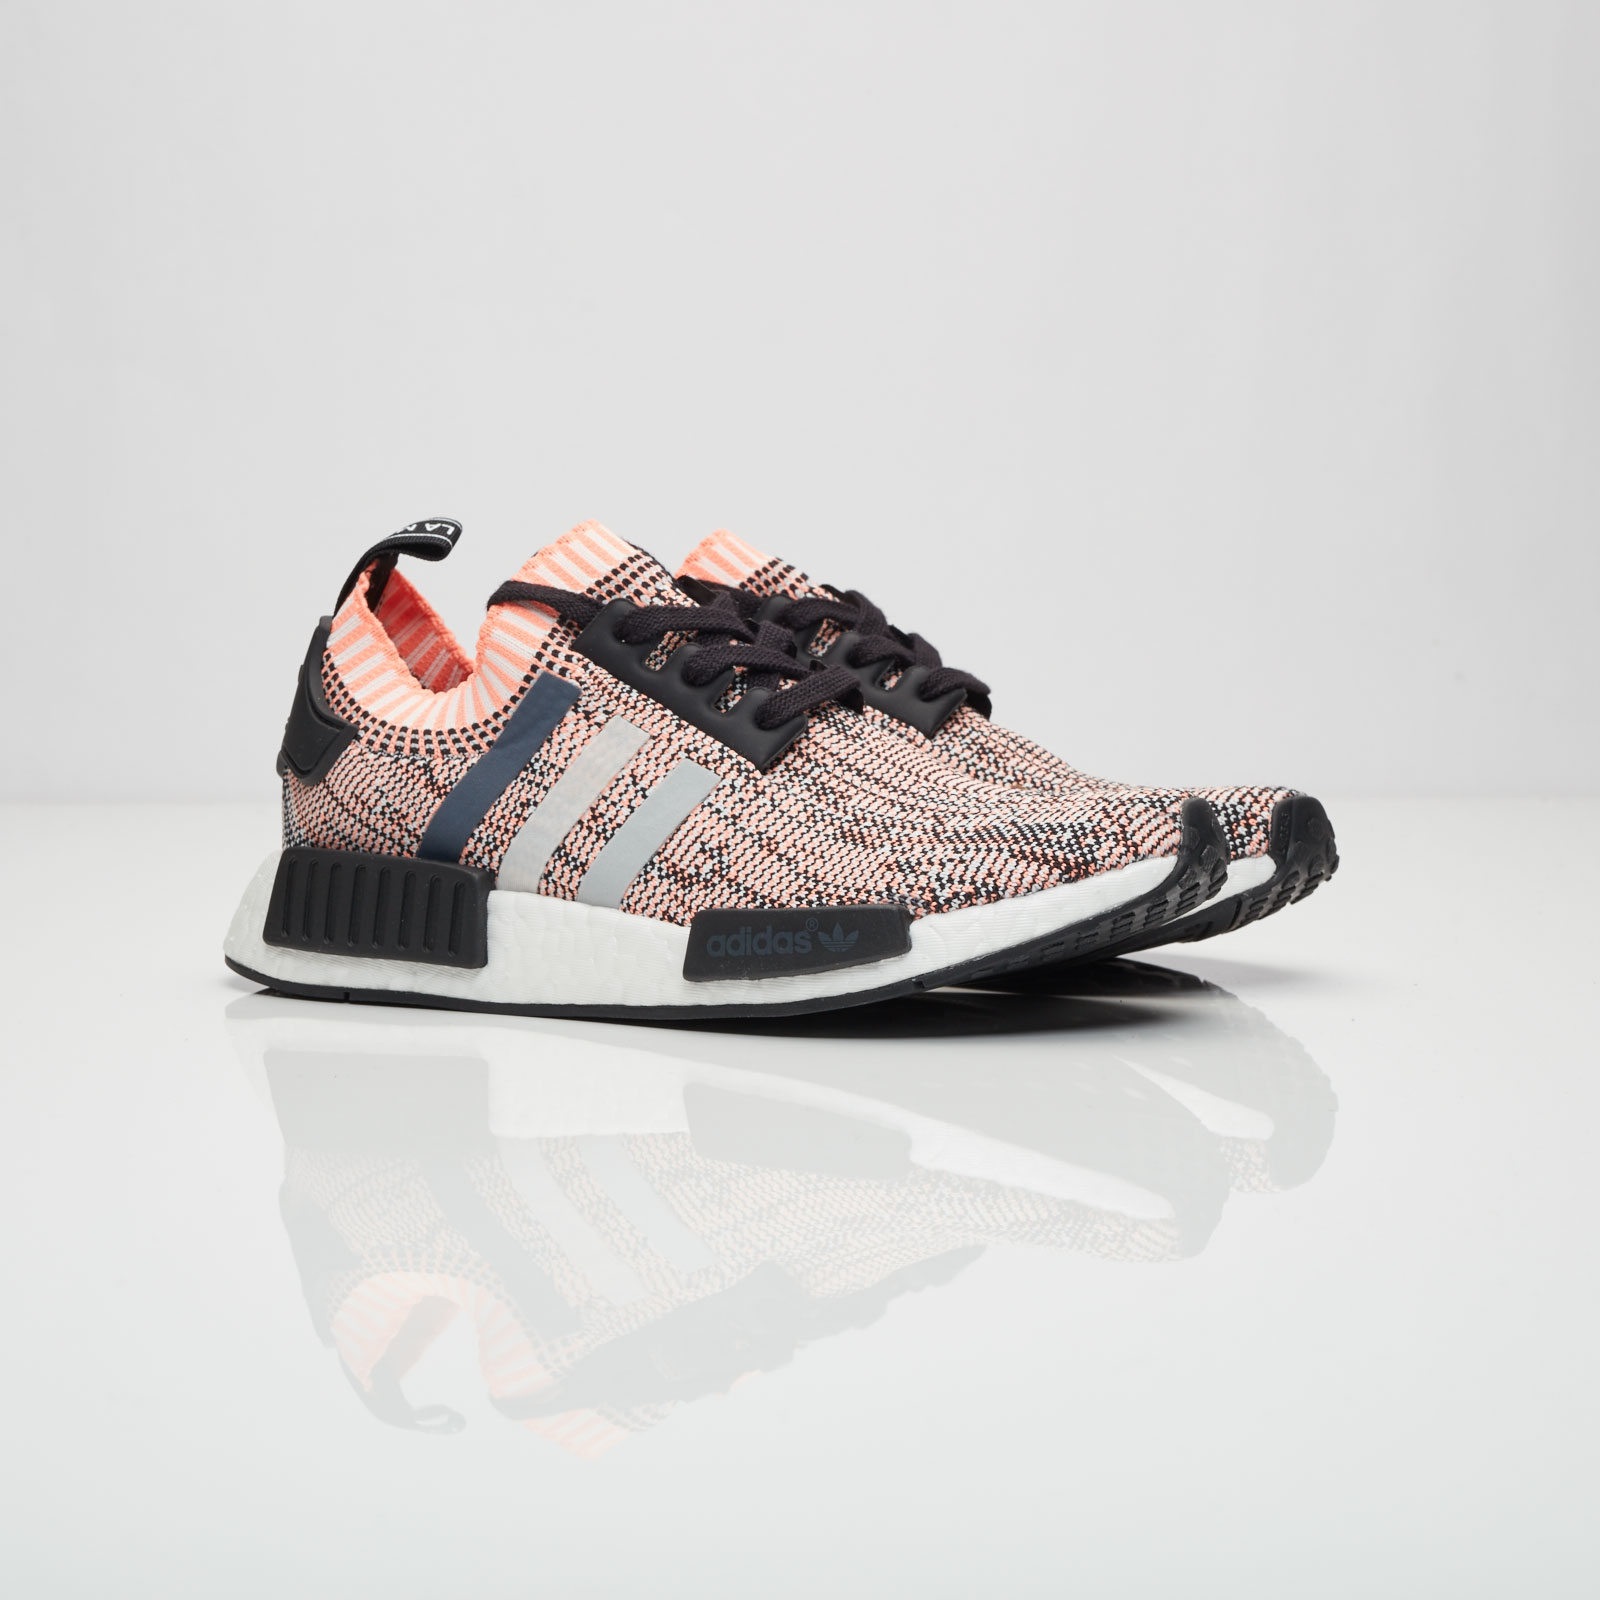 7e89647da adidas NMD R1 W PK - Bb2361 - Sneakersnstuff